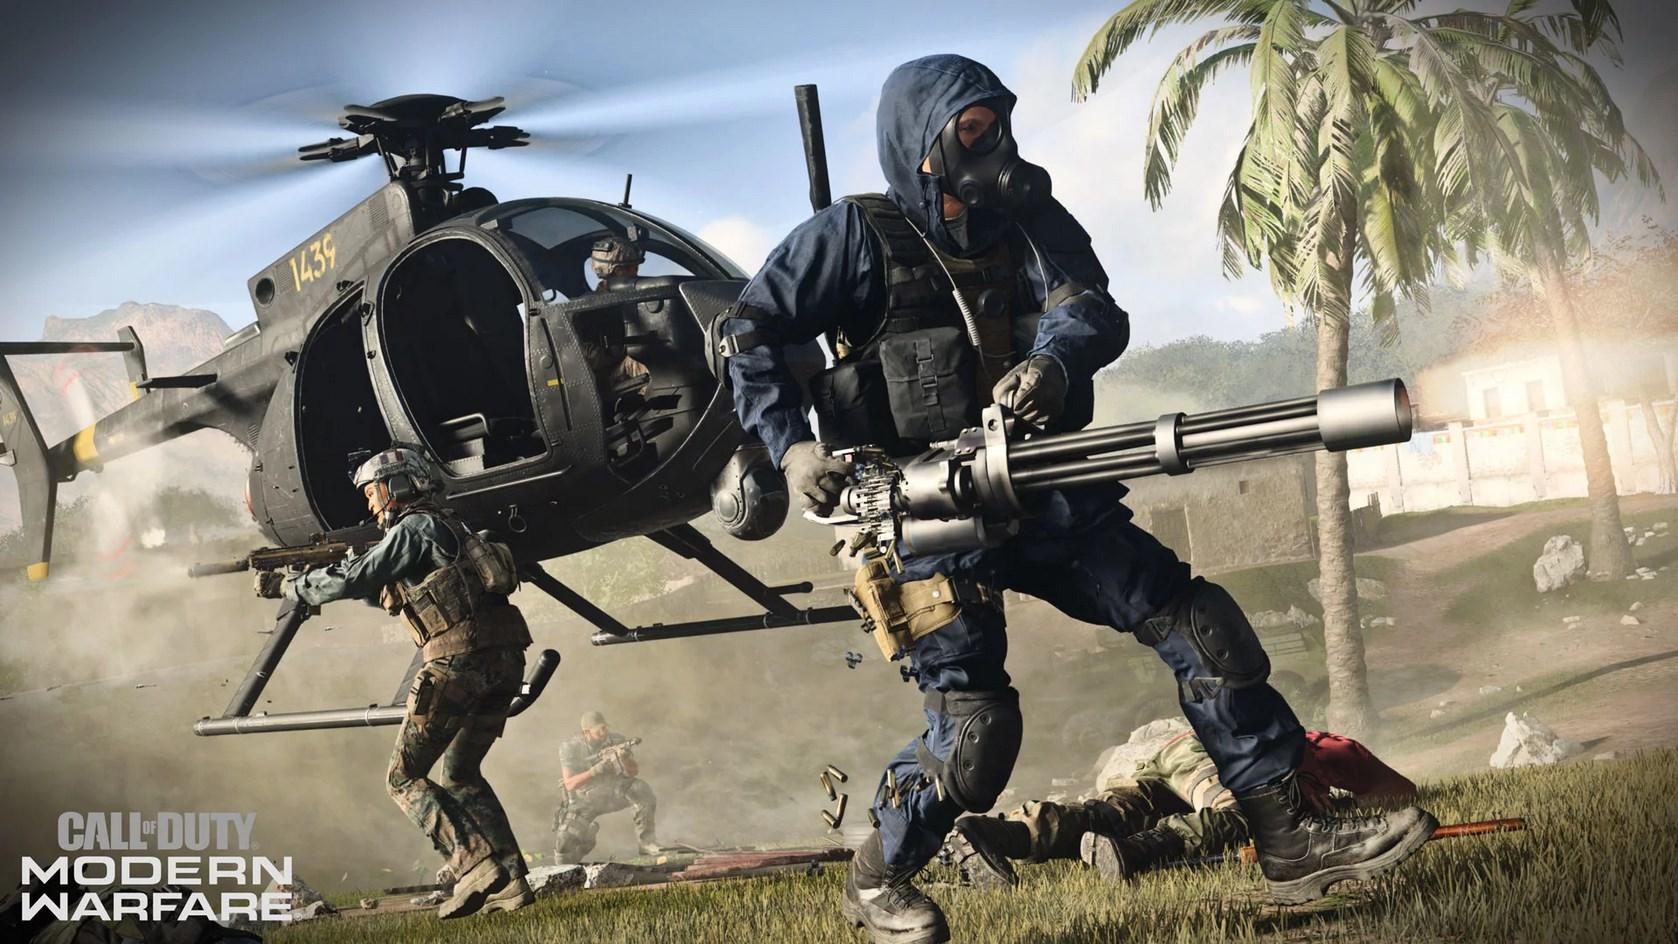 Player firing a minigun in Modern Warfare.